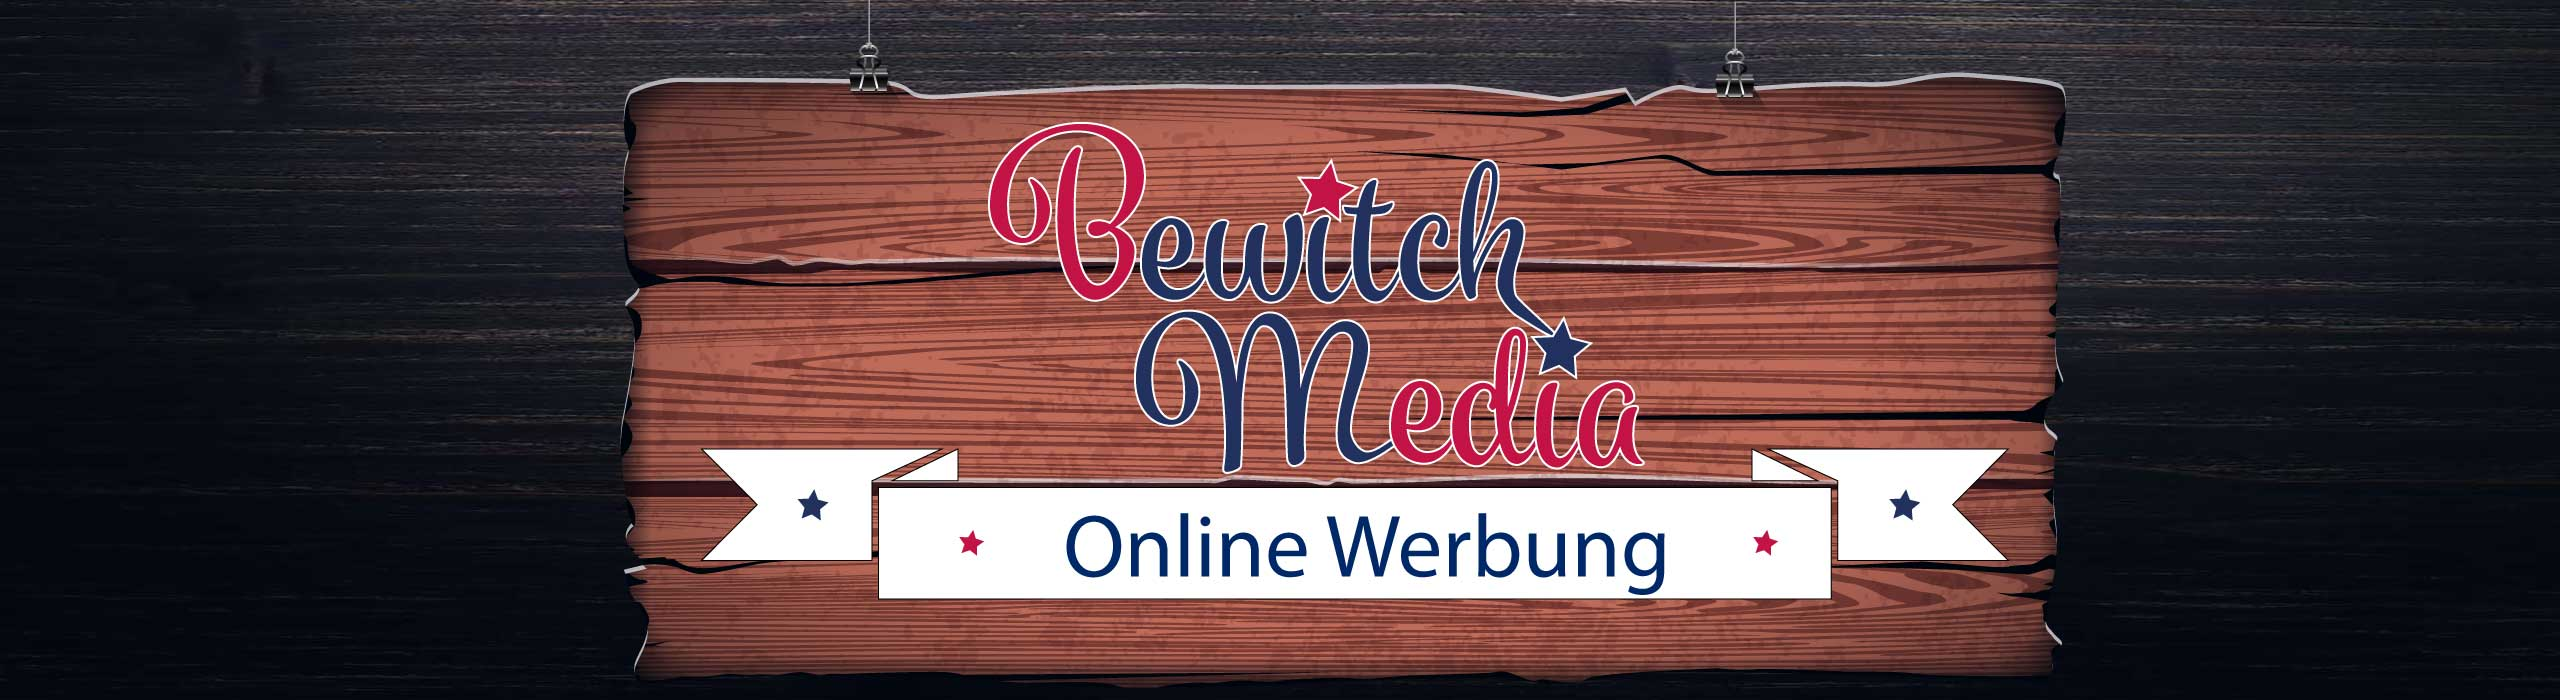 Online-Werbung-.-digitale-Werbung